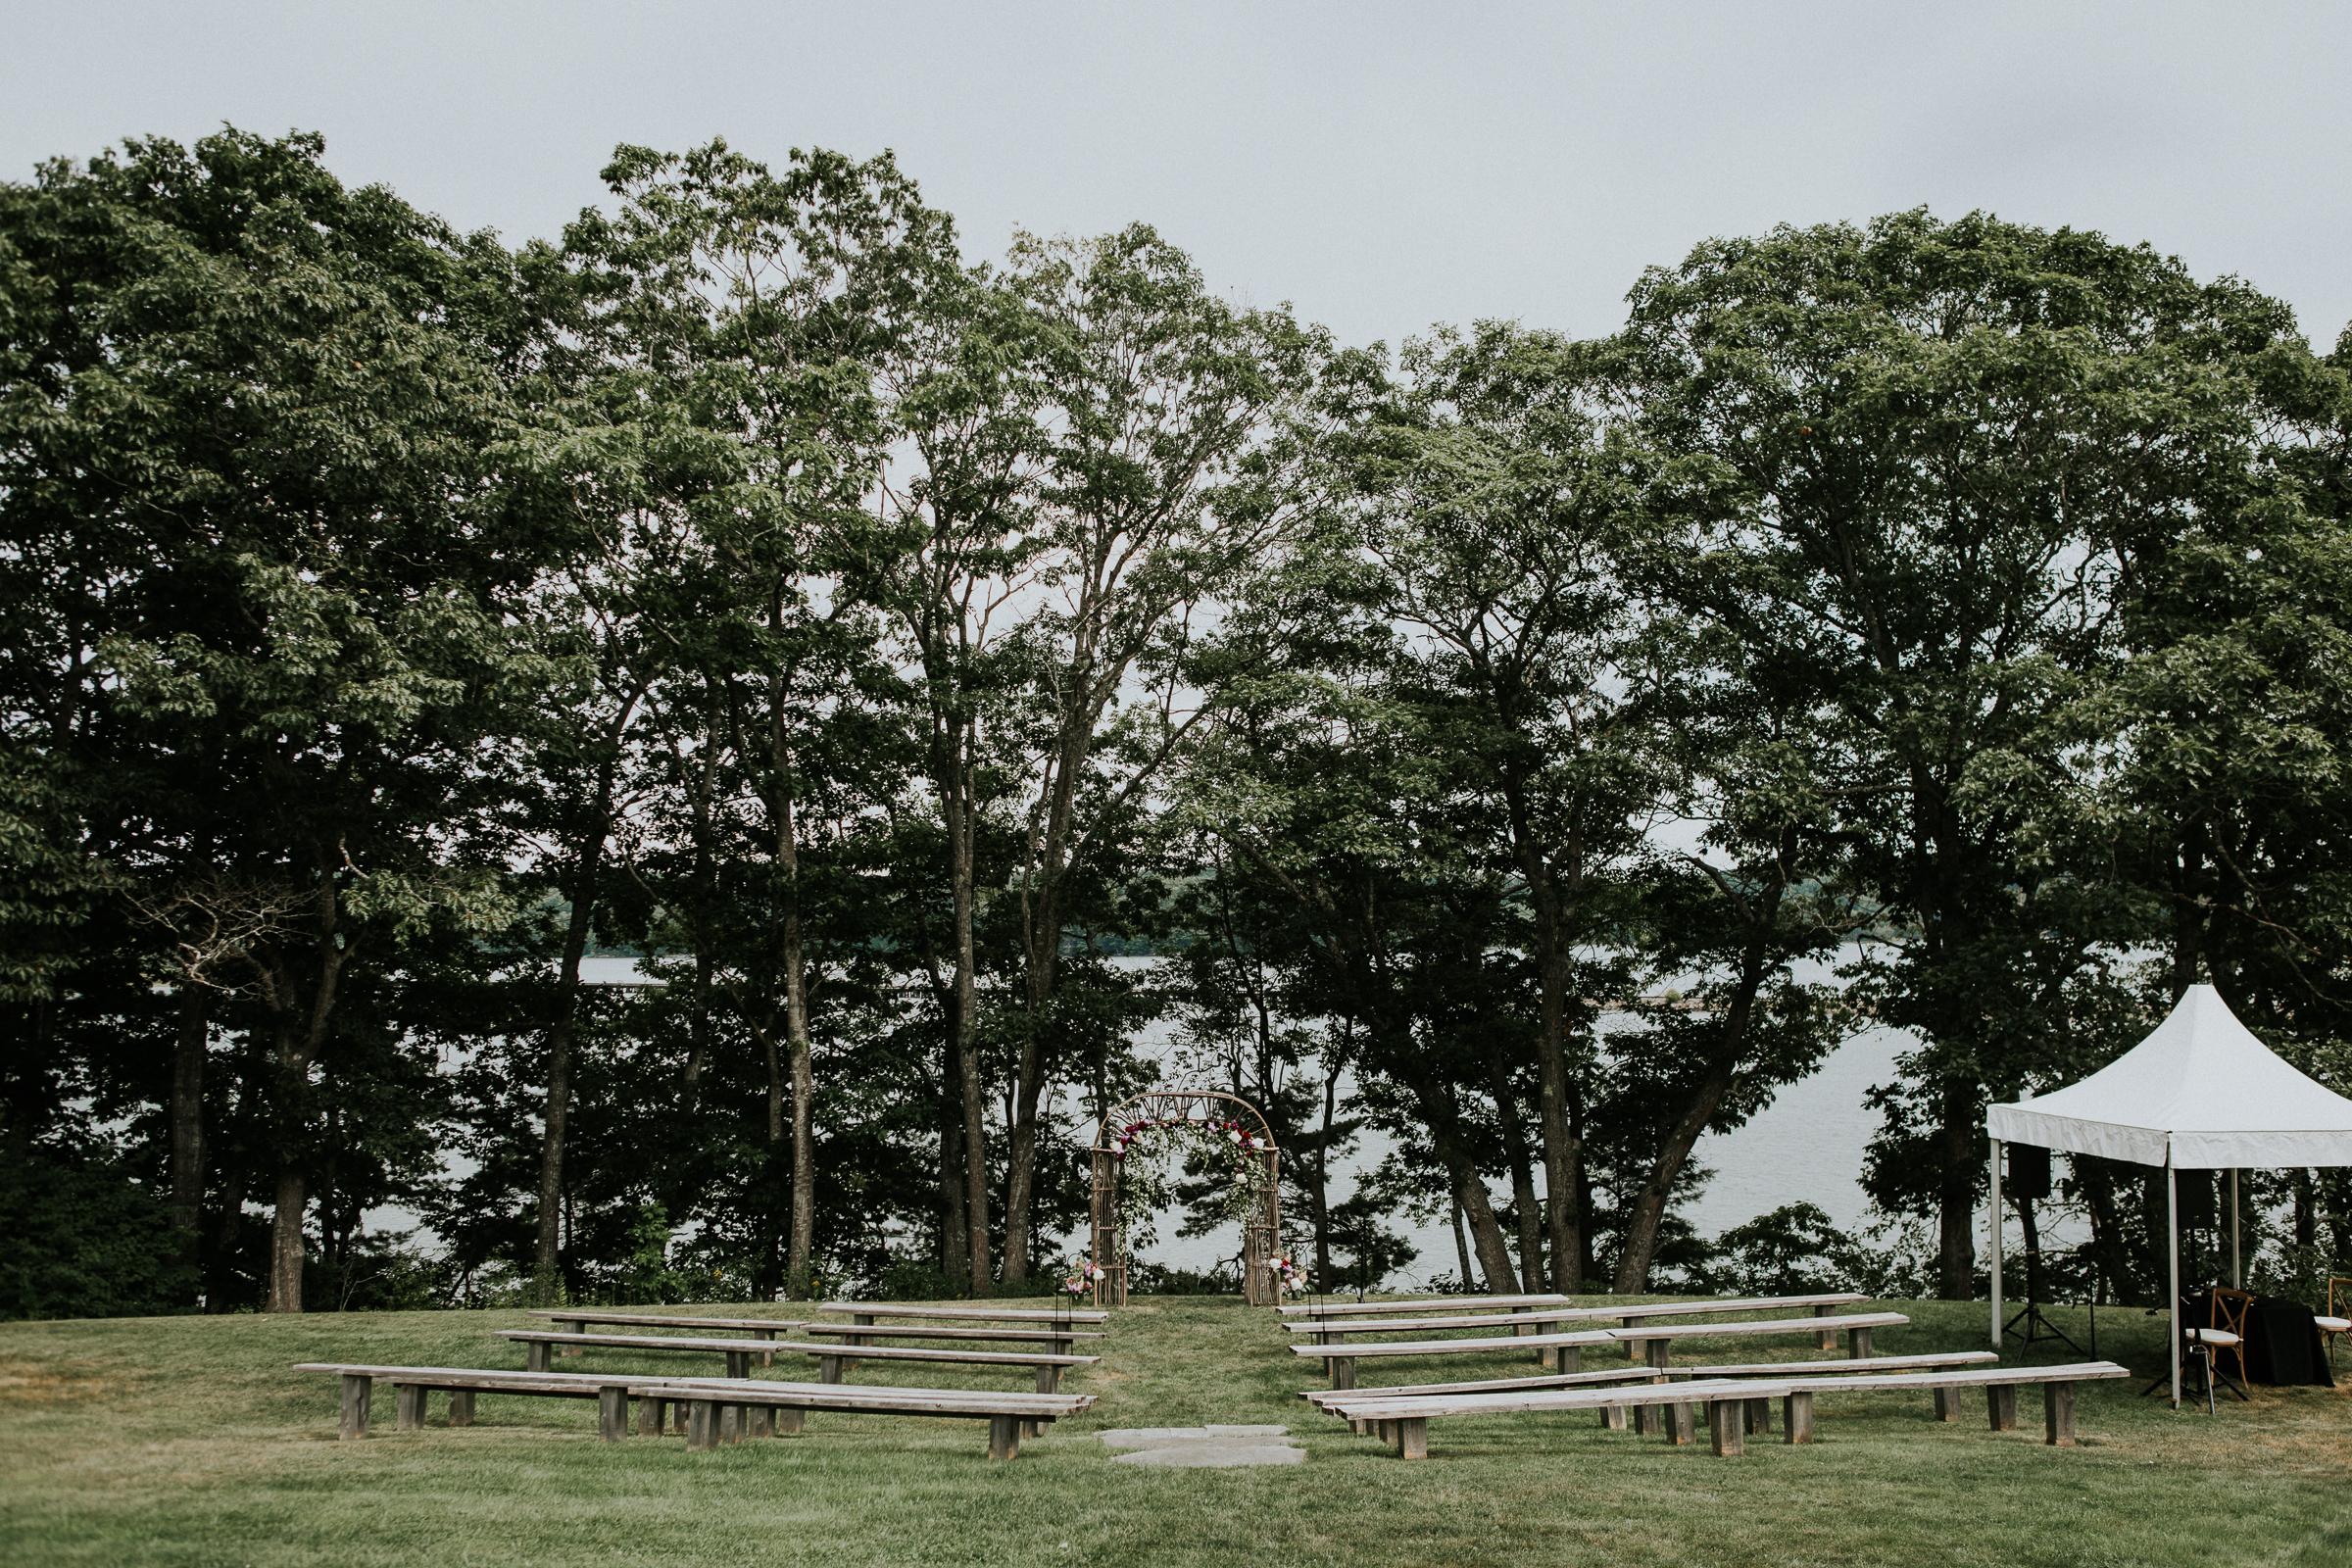 Marianmade-Farm-Wiscasset-Maine-Fine-Art-Documentary-Wedding-Photographer-Elvira-Kalviste-Photography-53.jpg